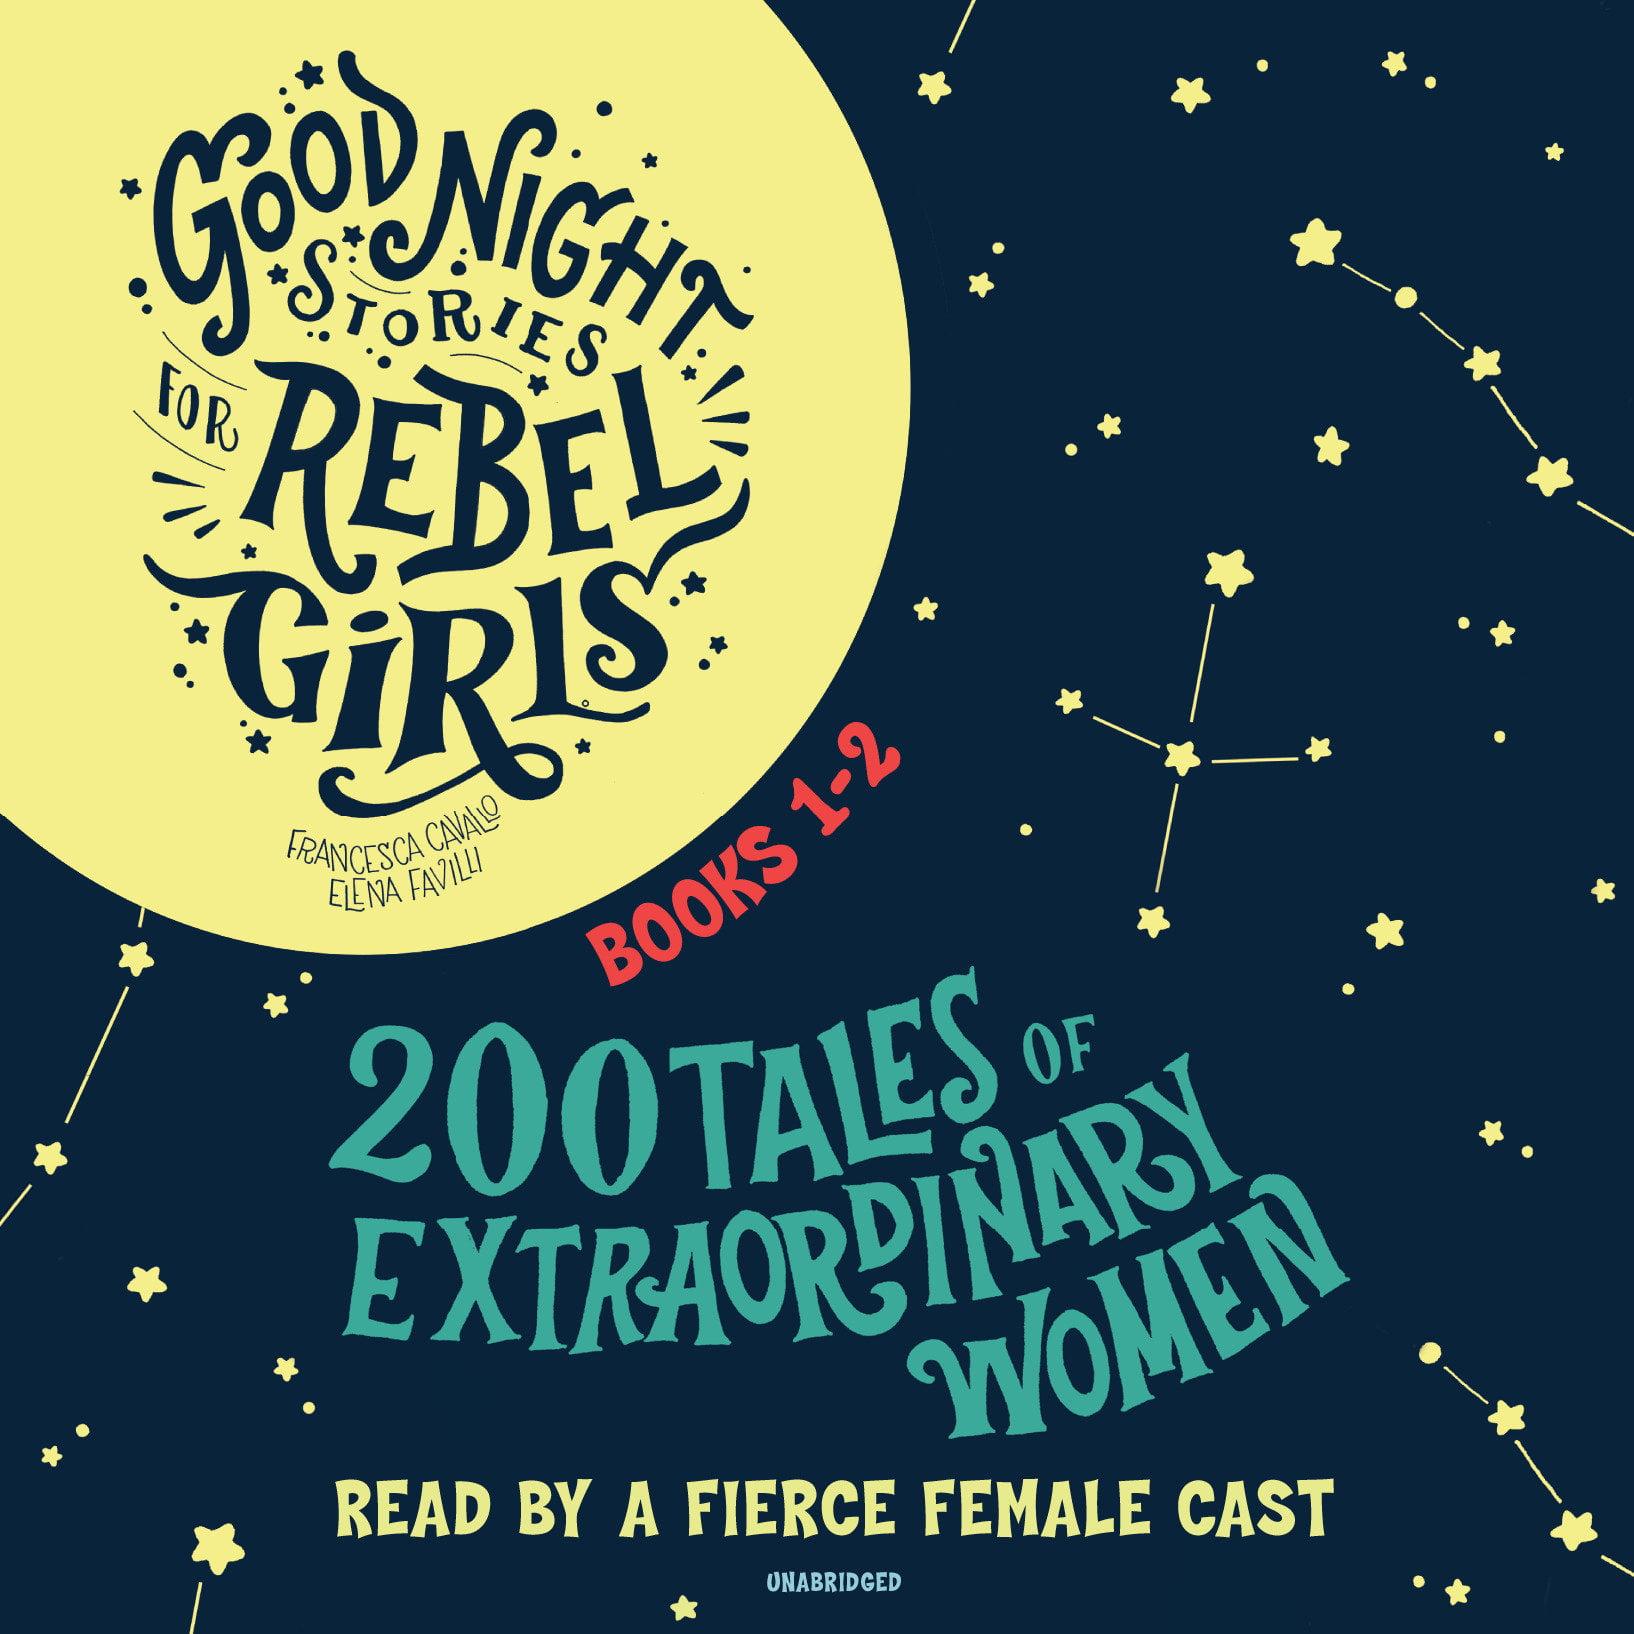 Good Night Stories for Rebel Girls 1-2